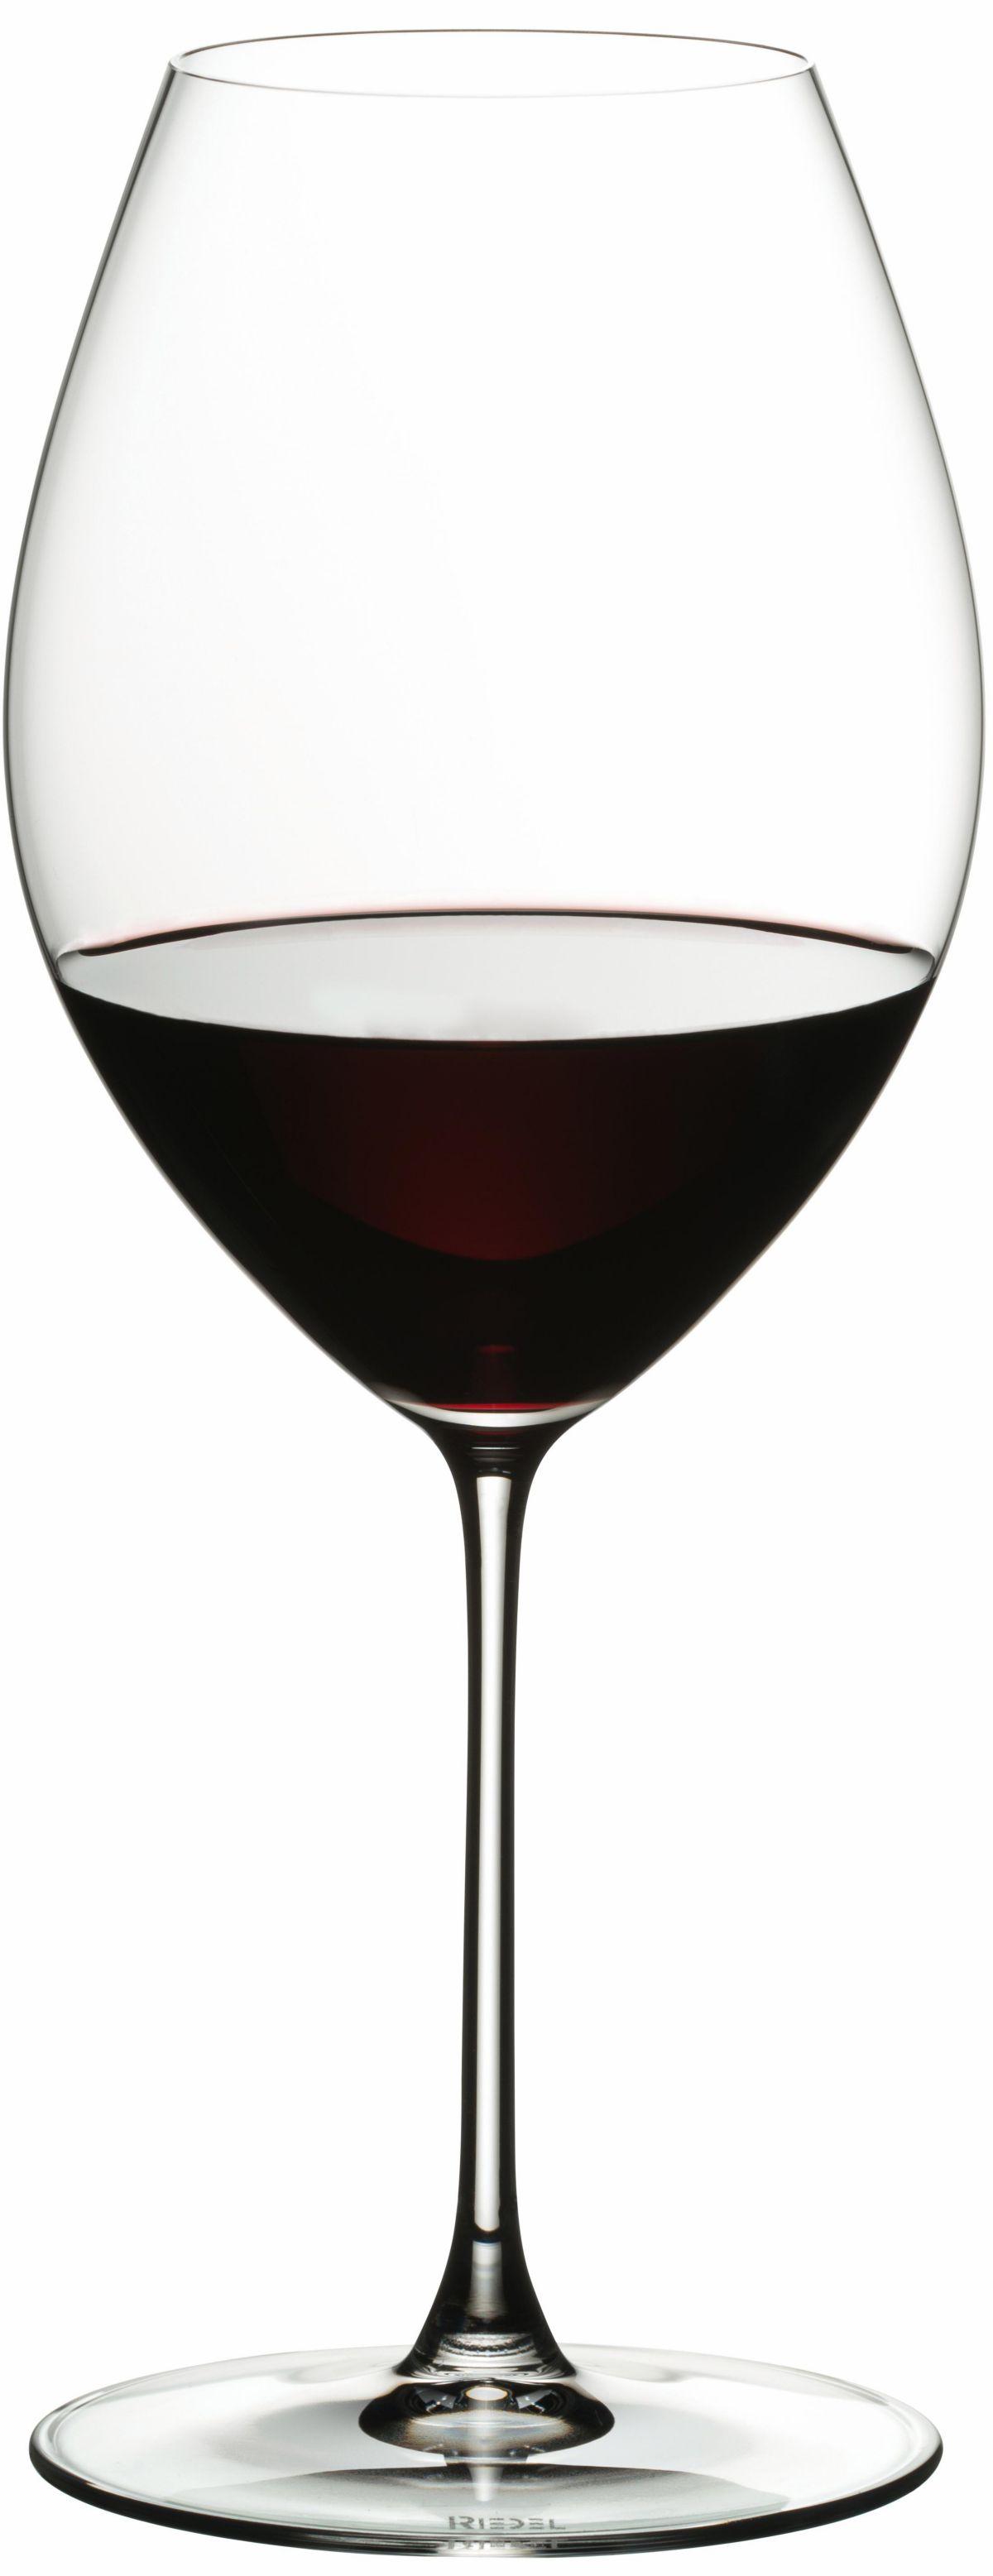 RIEDEL GLASS Wein-Glas, Old World Syrah, 2er Se...